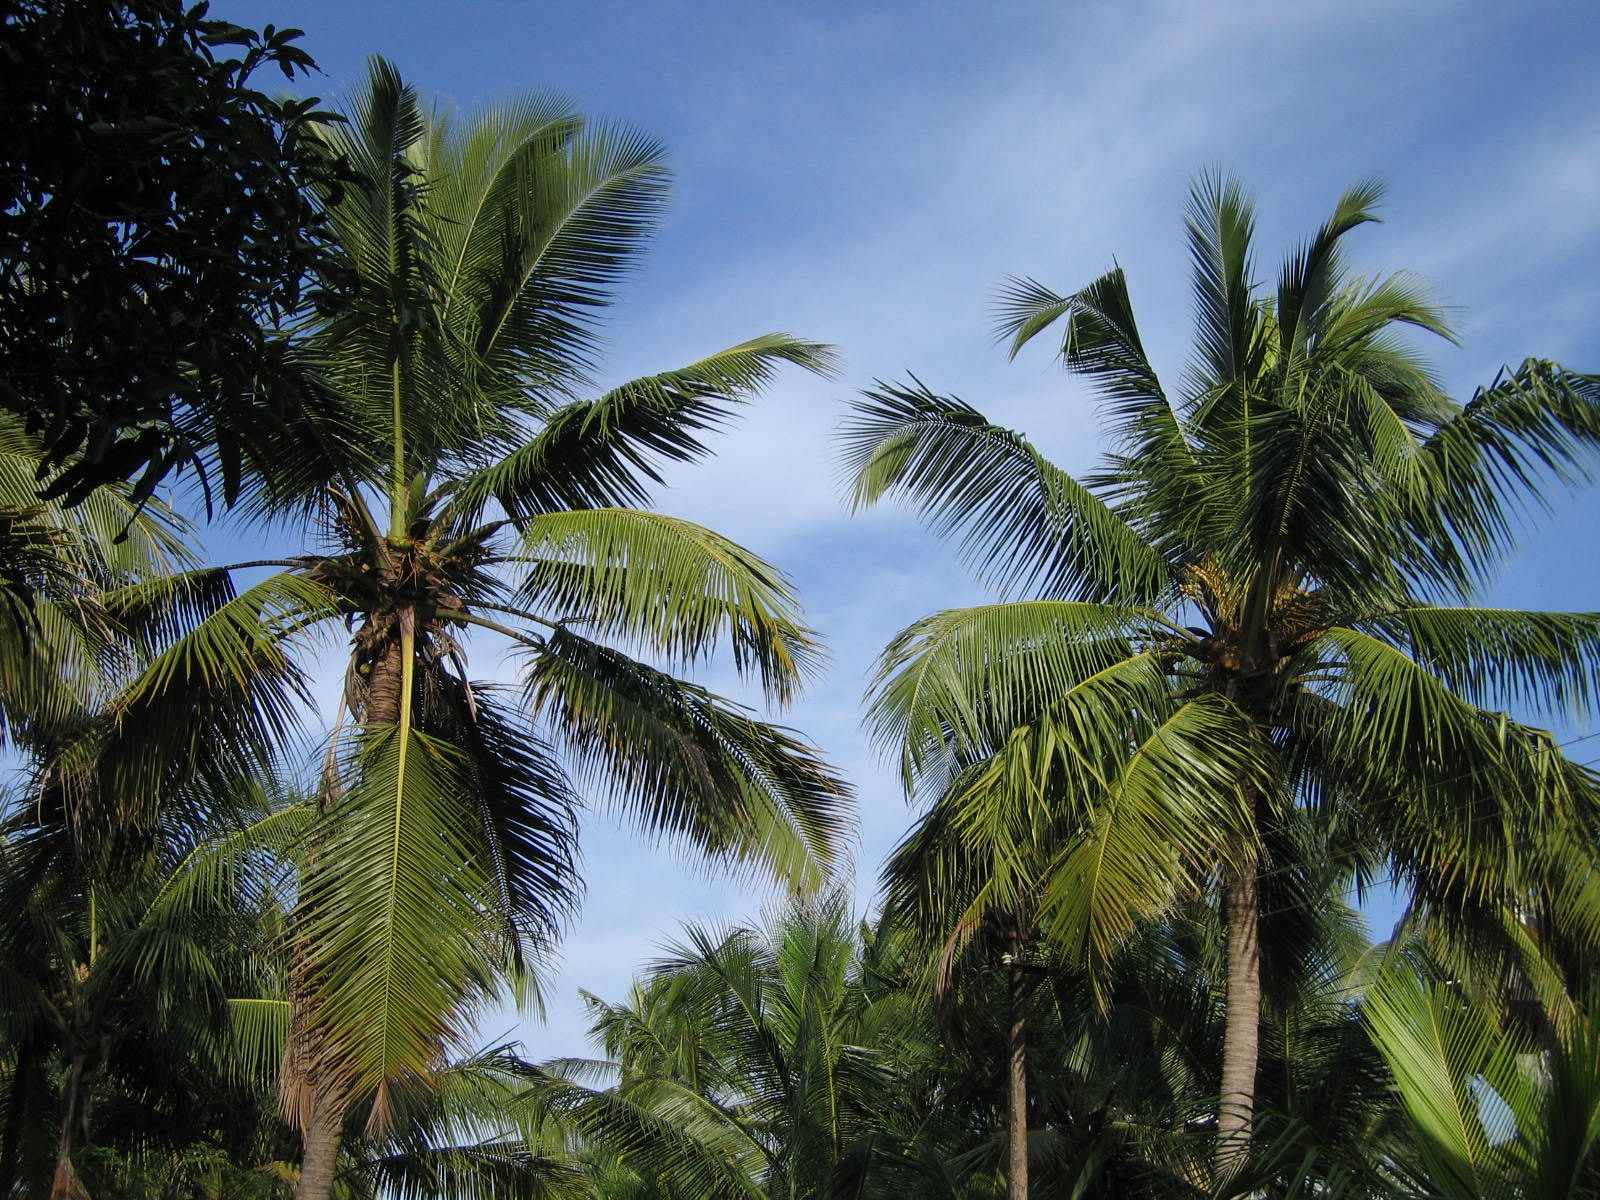 File:Coconut Tree in Kerala.jpg - Wikipedia